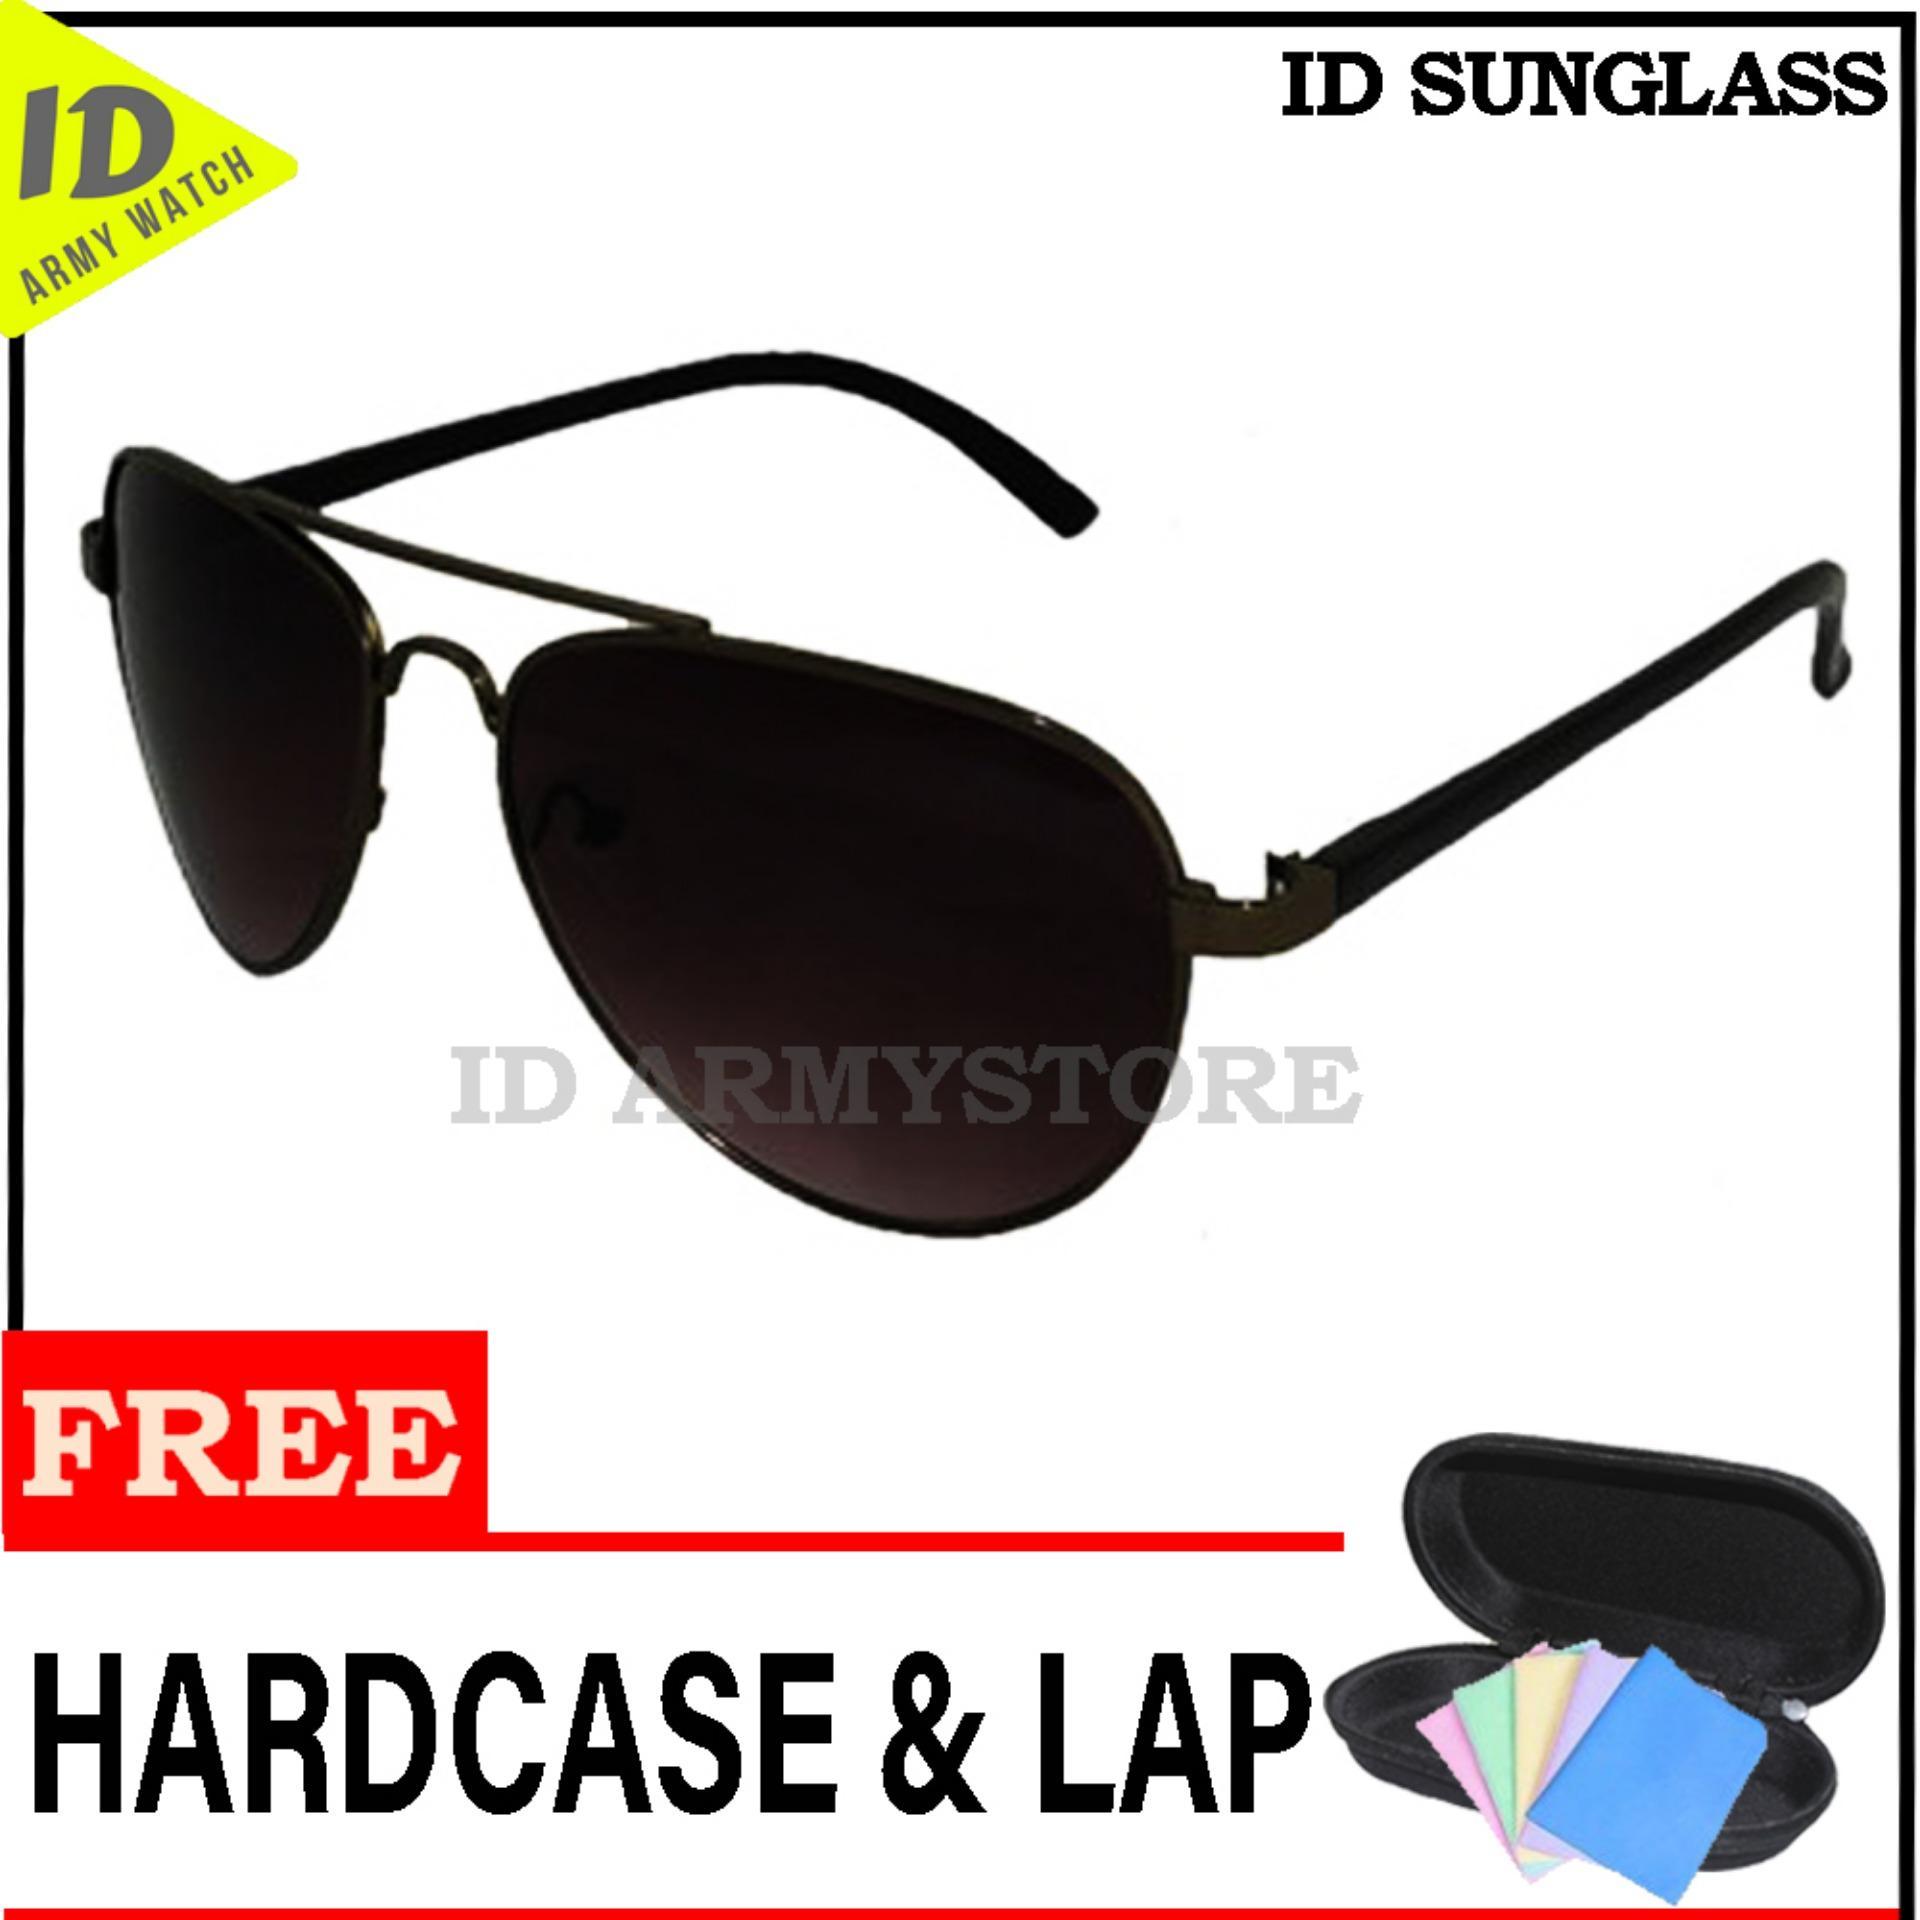 ID Sunglass - Kacamata Aviat Pria Wanita - Frame Hitam - Lensa Coklat SUN  1003- d34cc3fcfd